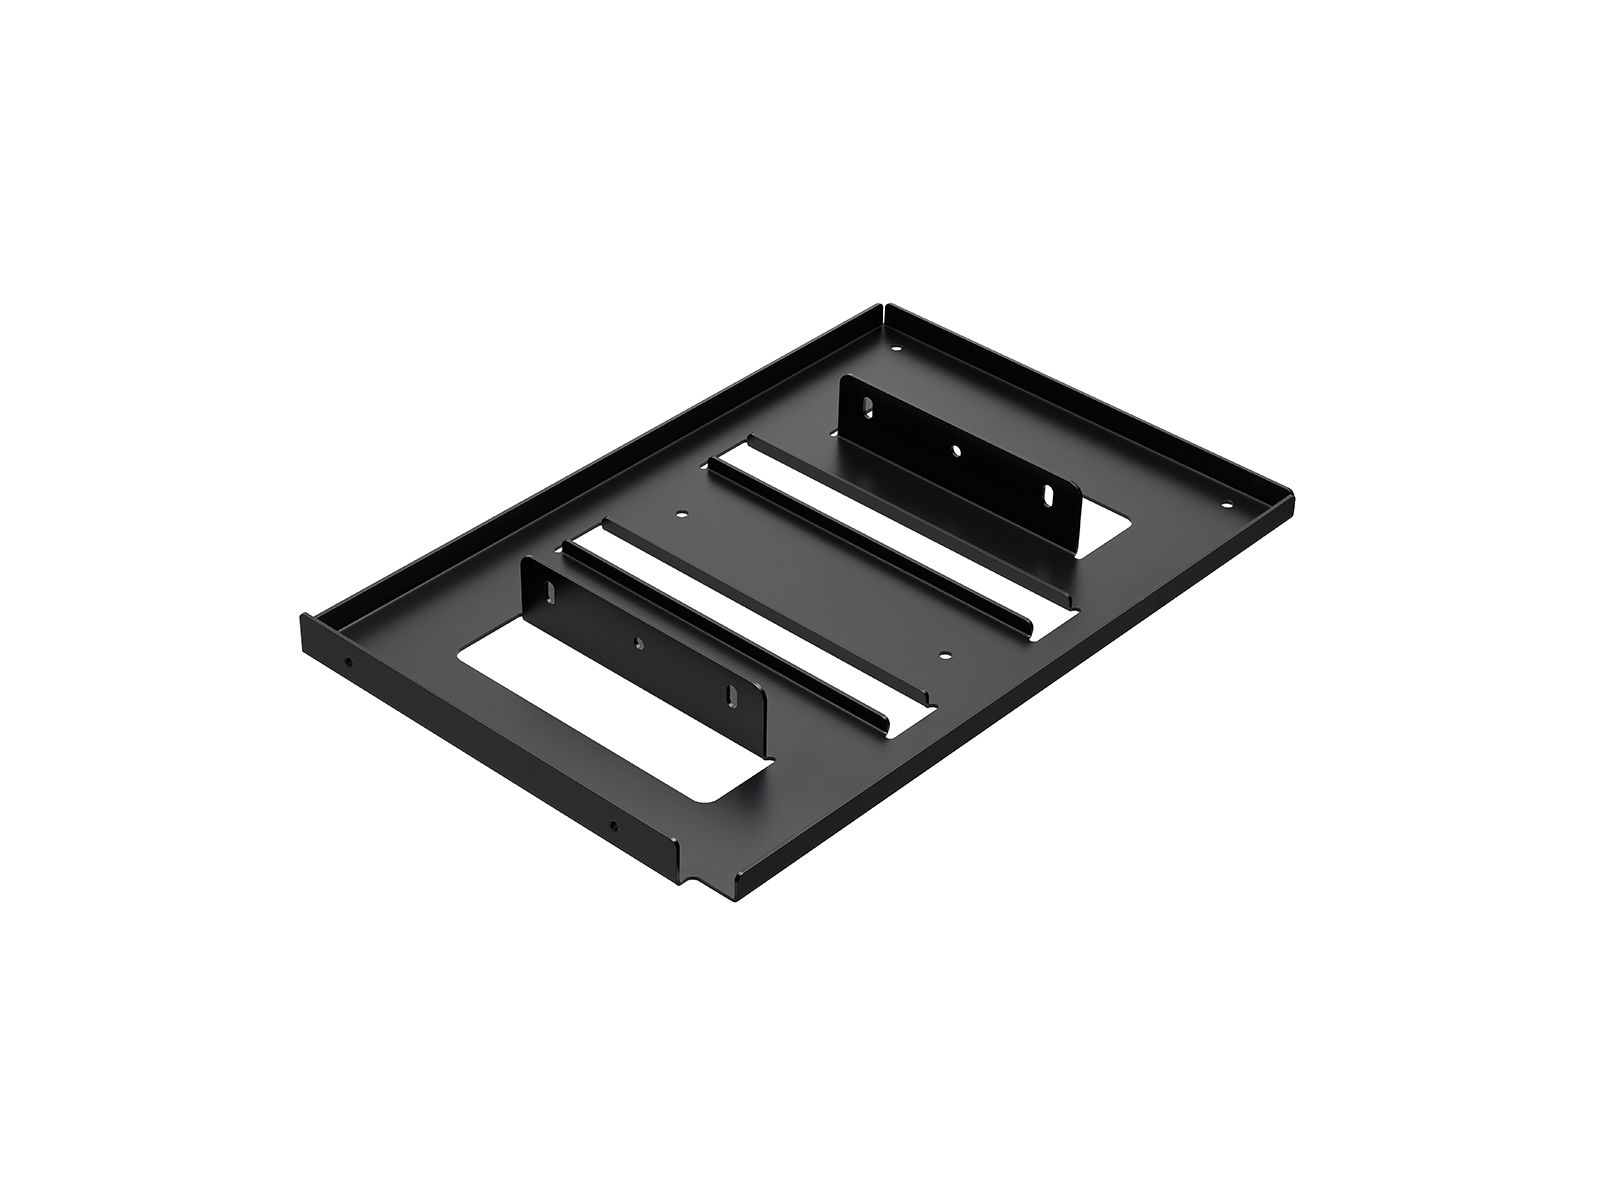 Panasonic ET-PKD520B | Deckenhalterung-Projektoraufnahme für 3-Chip DLP, PT-DS20K/DW17K/DZ16K/DZ21K/RS11K/RQ13K/RZ12K